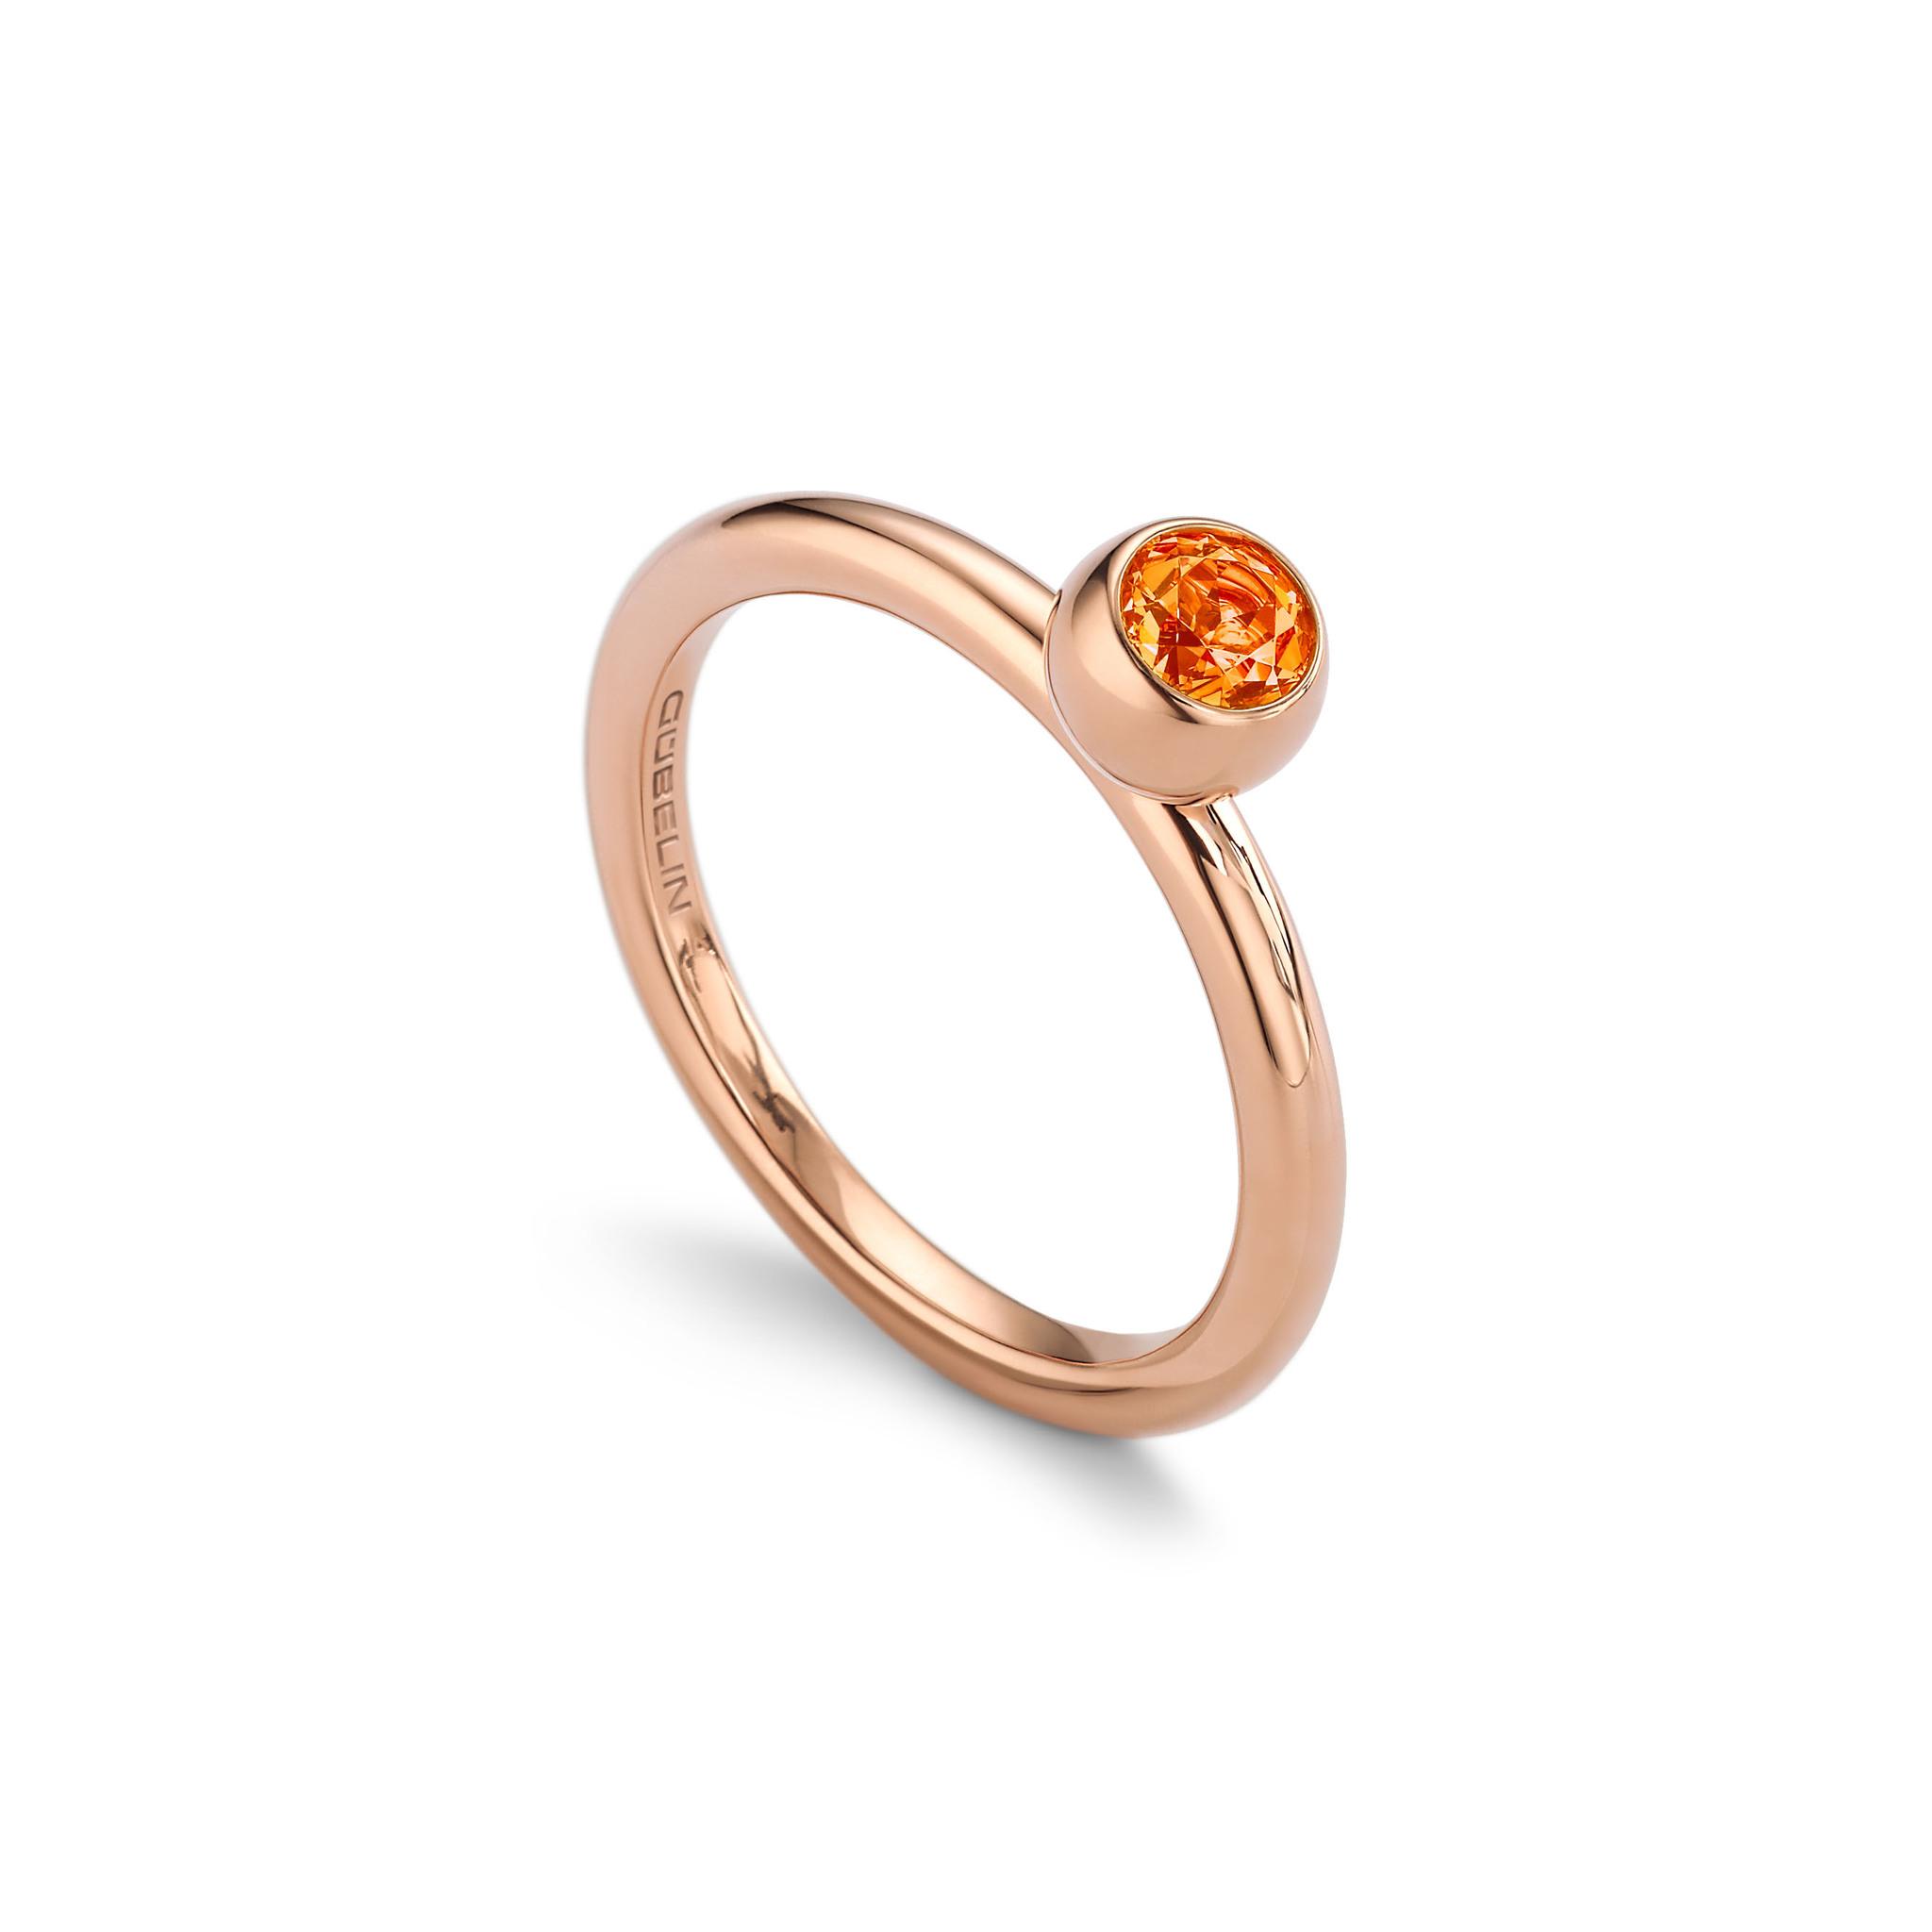 Ring with mandarin garnet